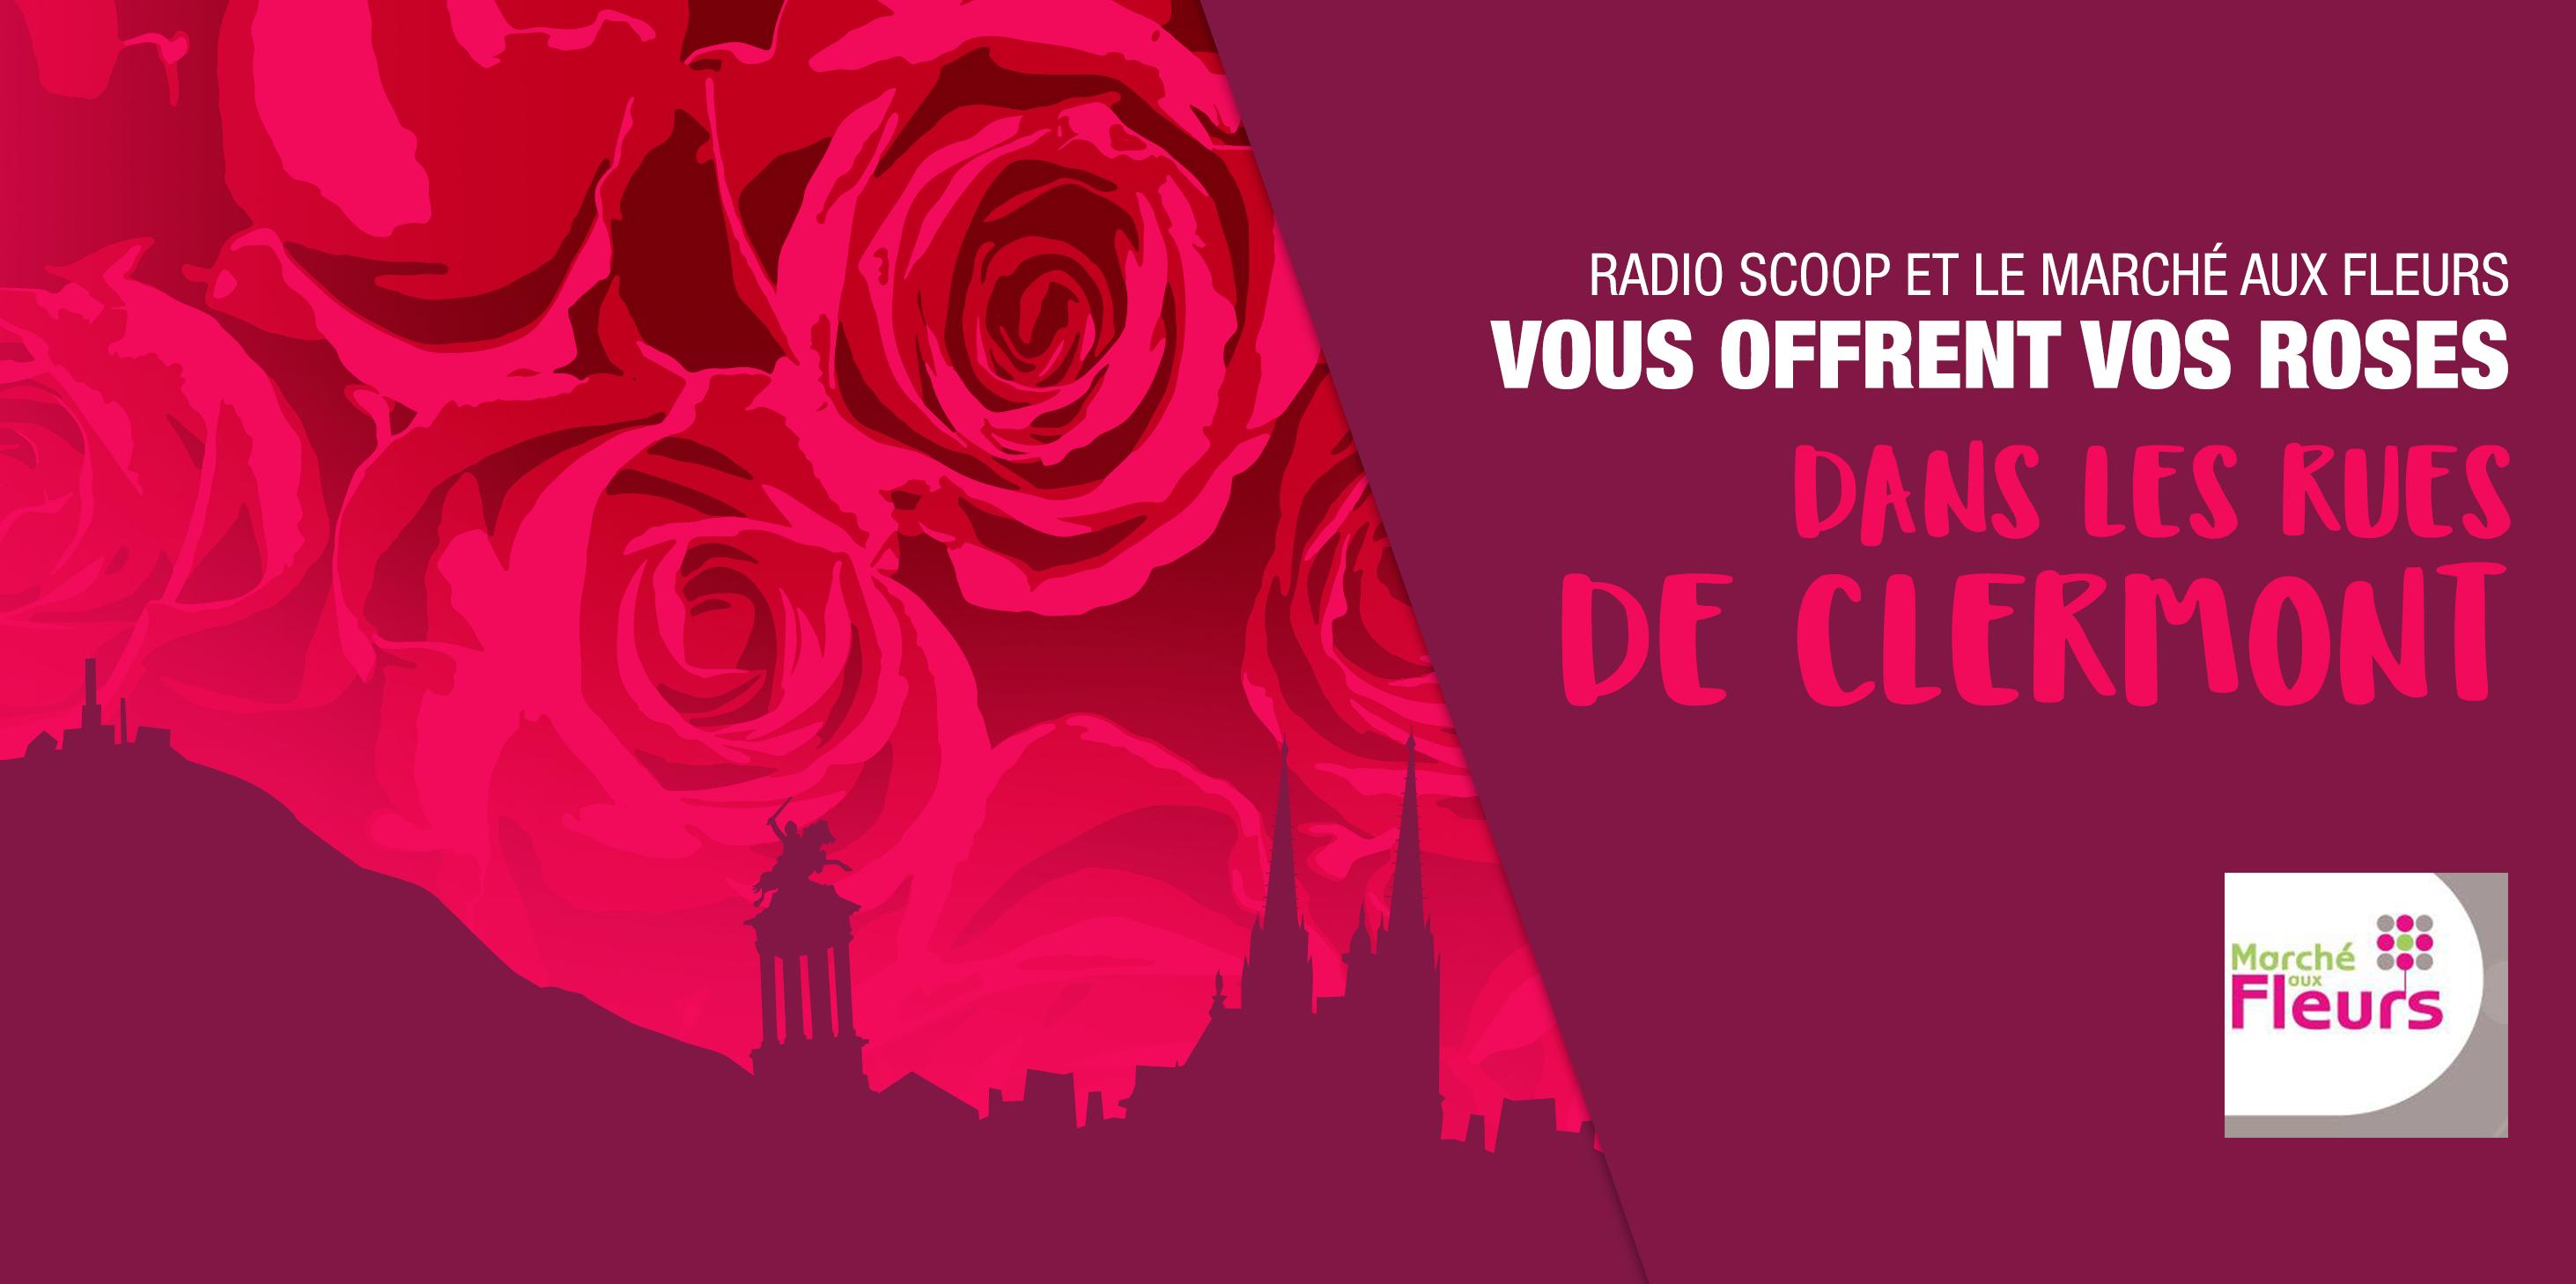 saint valentin radio scoop vous offre des roses clermont radio scoop. Black Bedroom Furniture Sets. Home Design Ideas